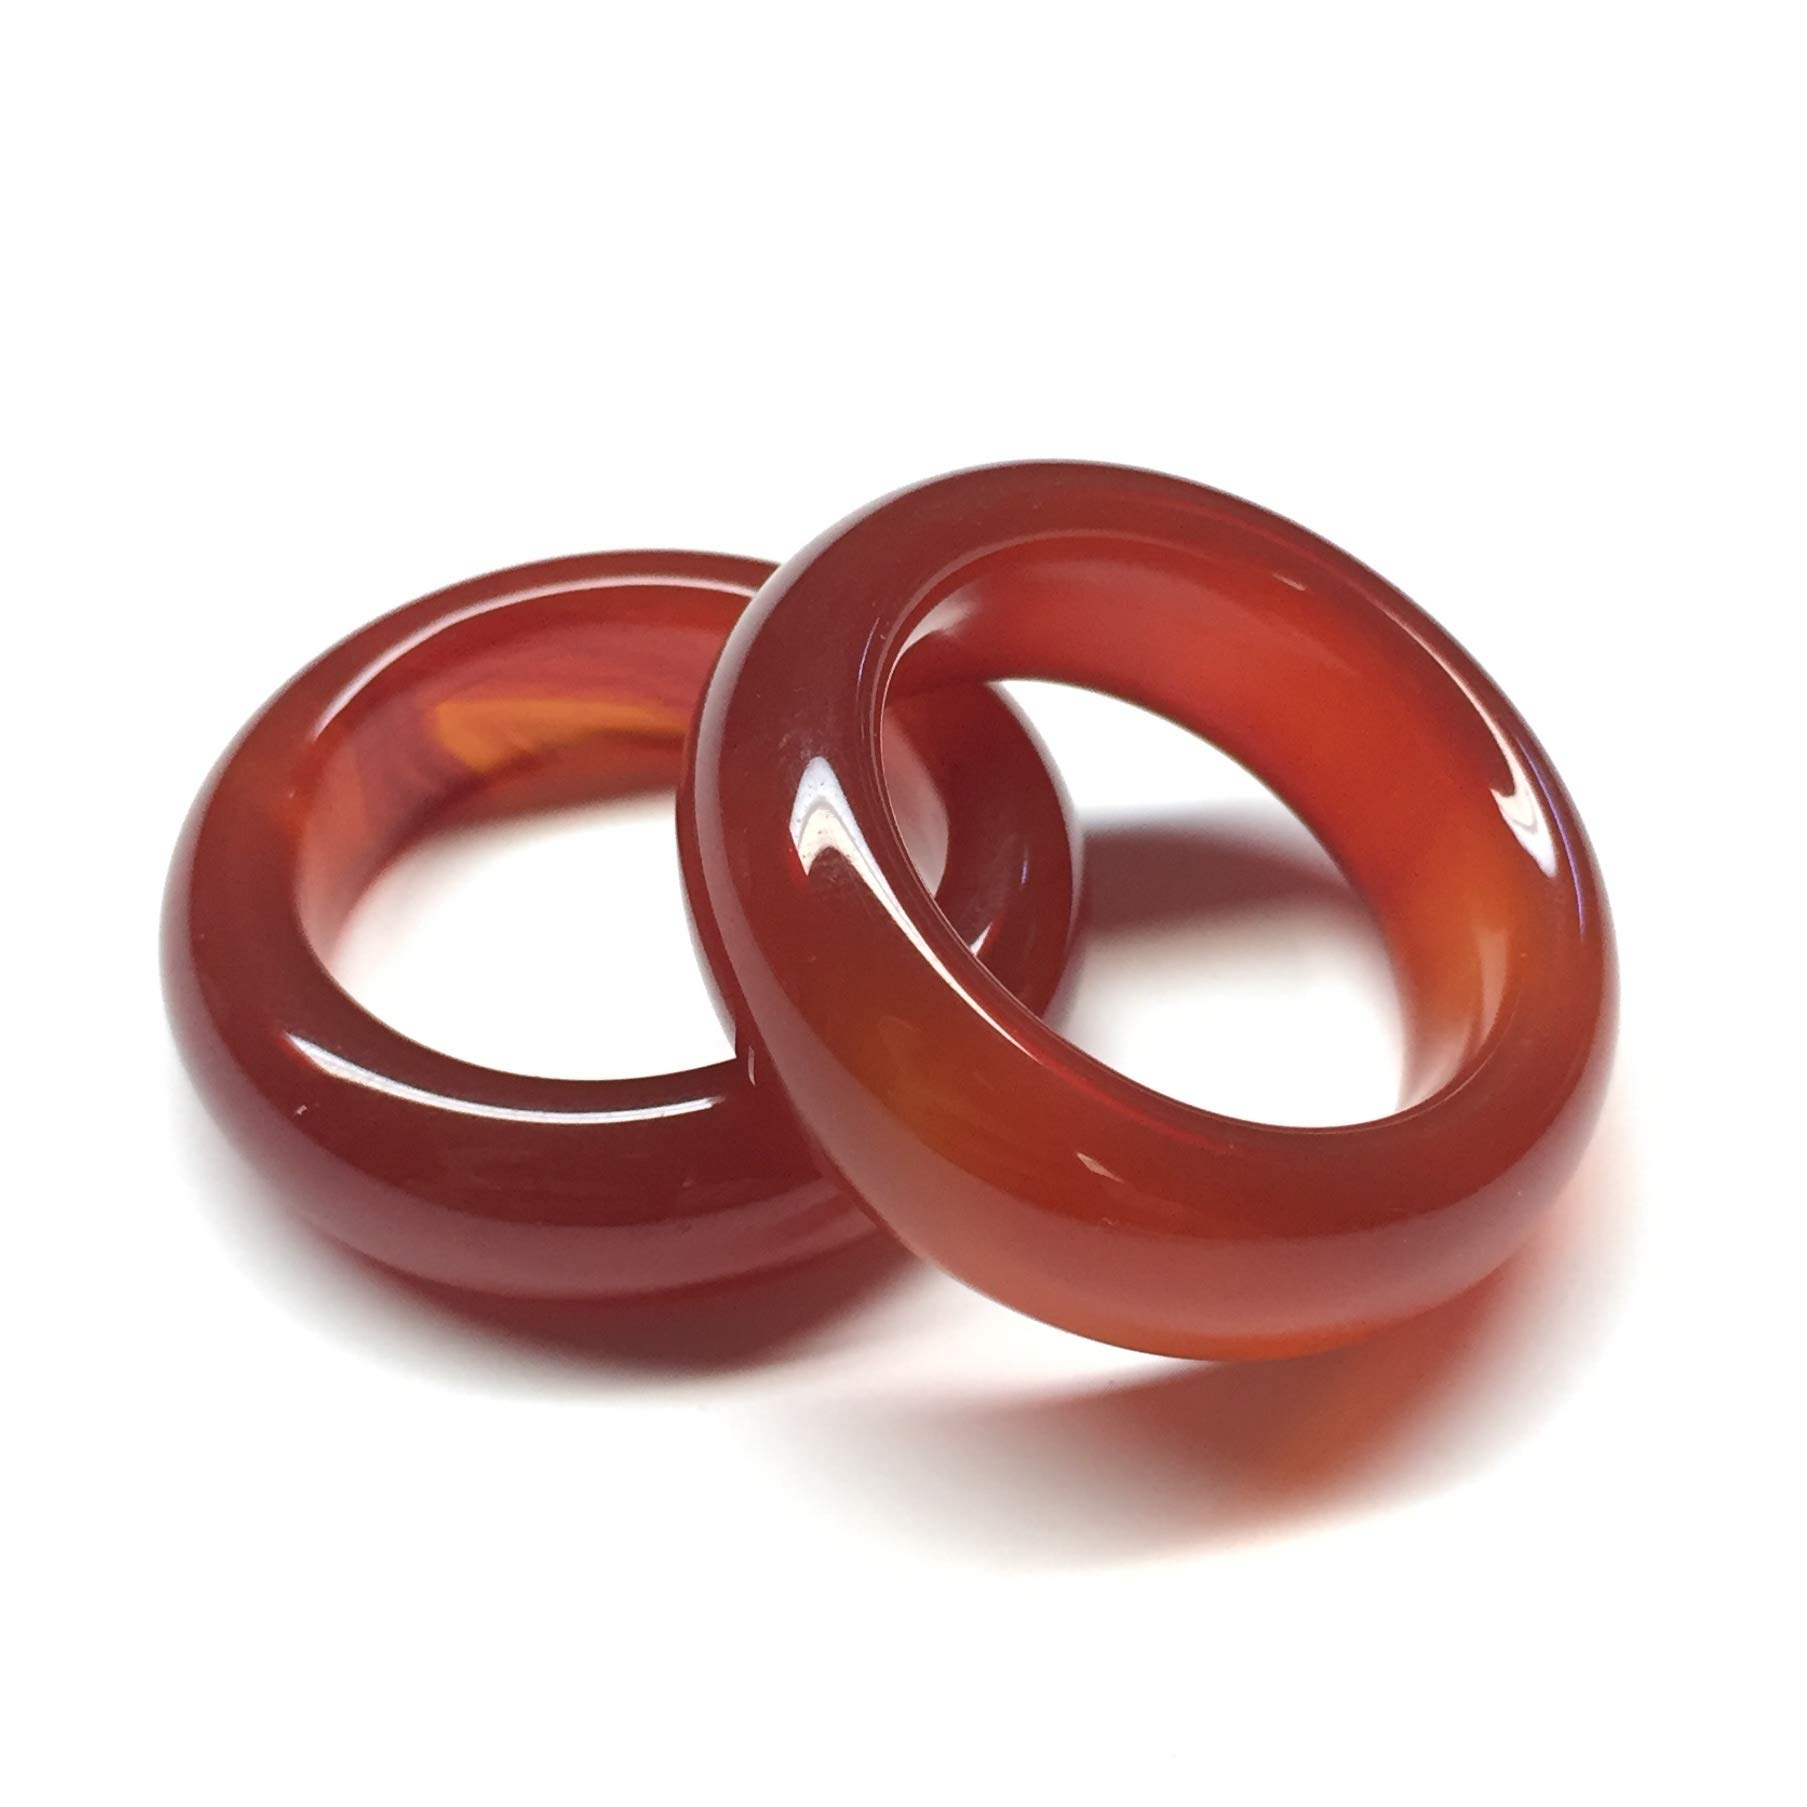 WHITESTONE JEWELRY CO. Strawberry Rhubarb Red Carnelian Stone Ring (Size 12.5) by WHITESTONE JEWELRY CO.